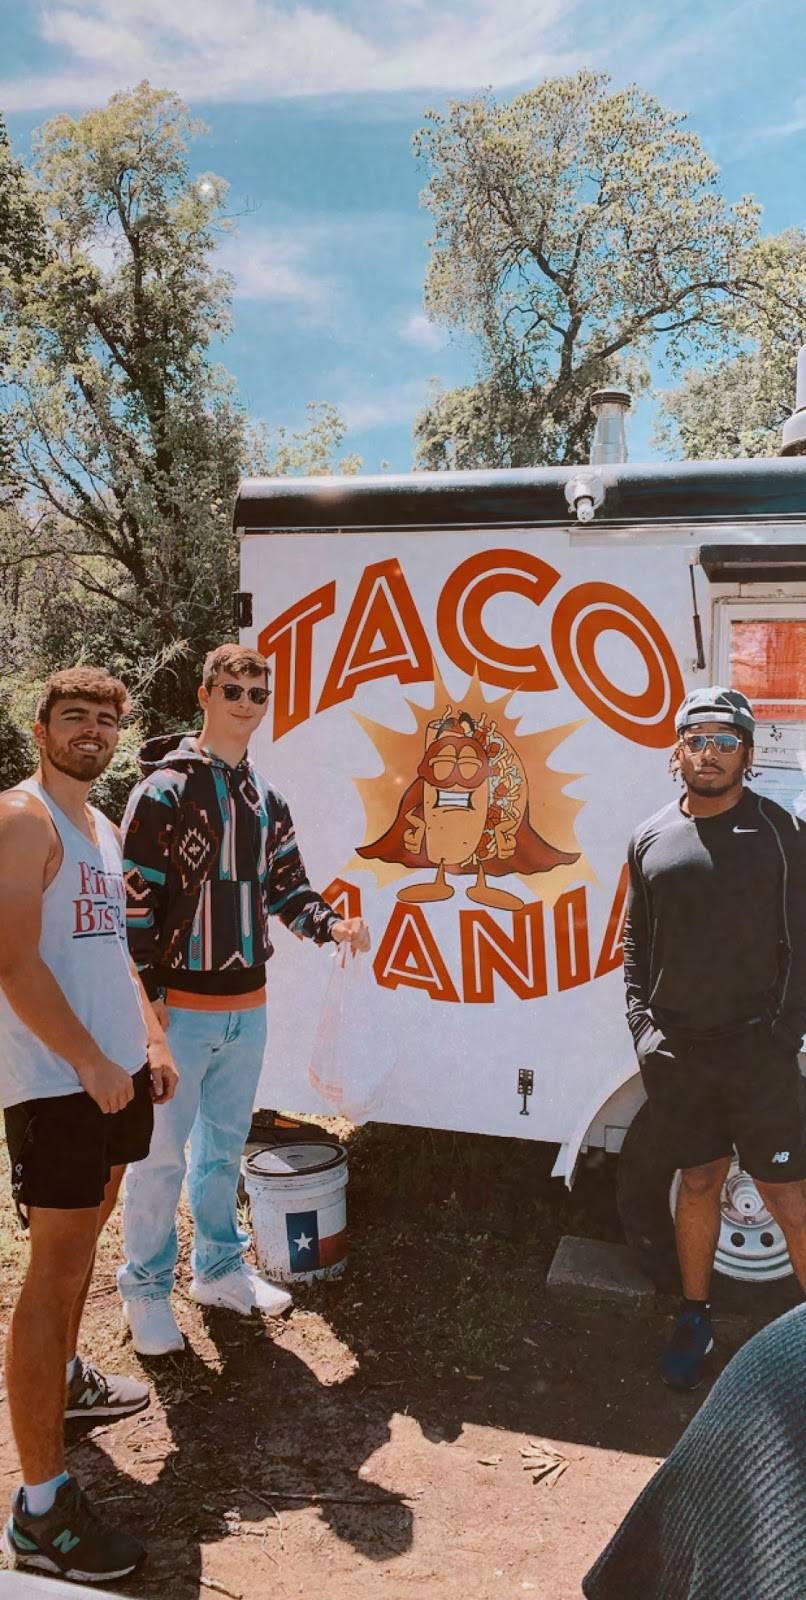 Taco Mania   restaurant   1110 Avenue M, Huntsville, TX 77340, USA   9366492663 OR +1 936-649-2663